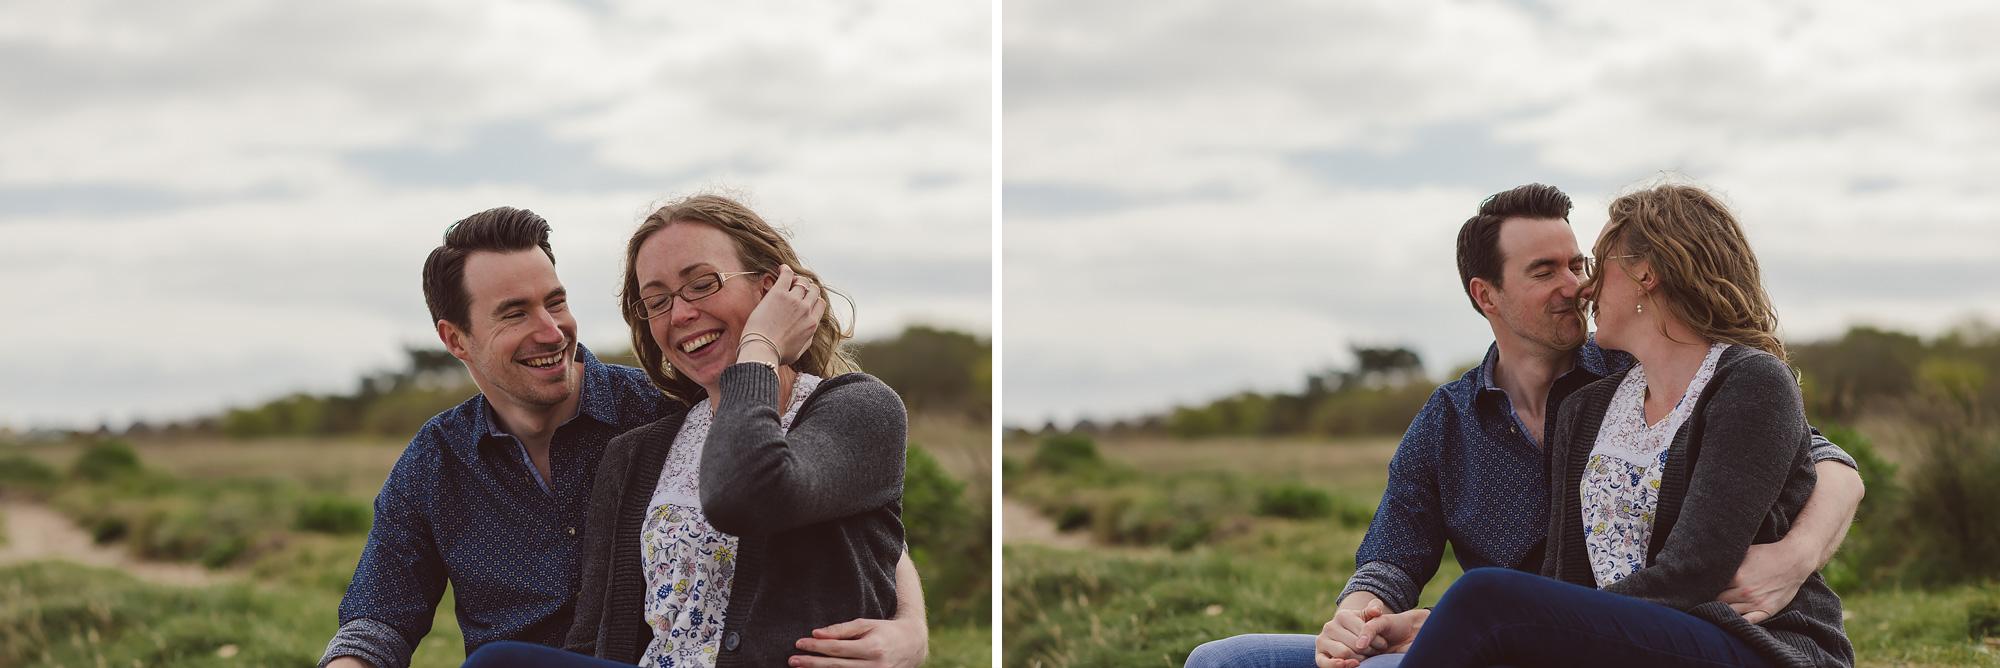 creative-pre-shoot-wedding-photography-grassland-dorset.jpg